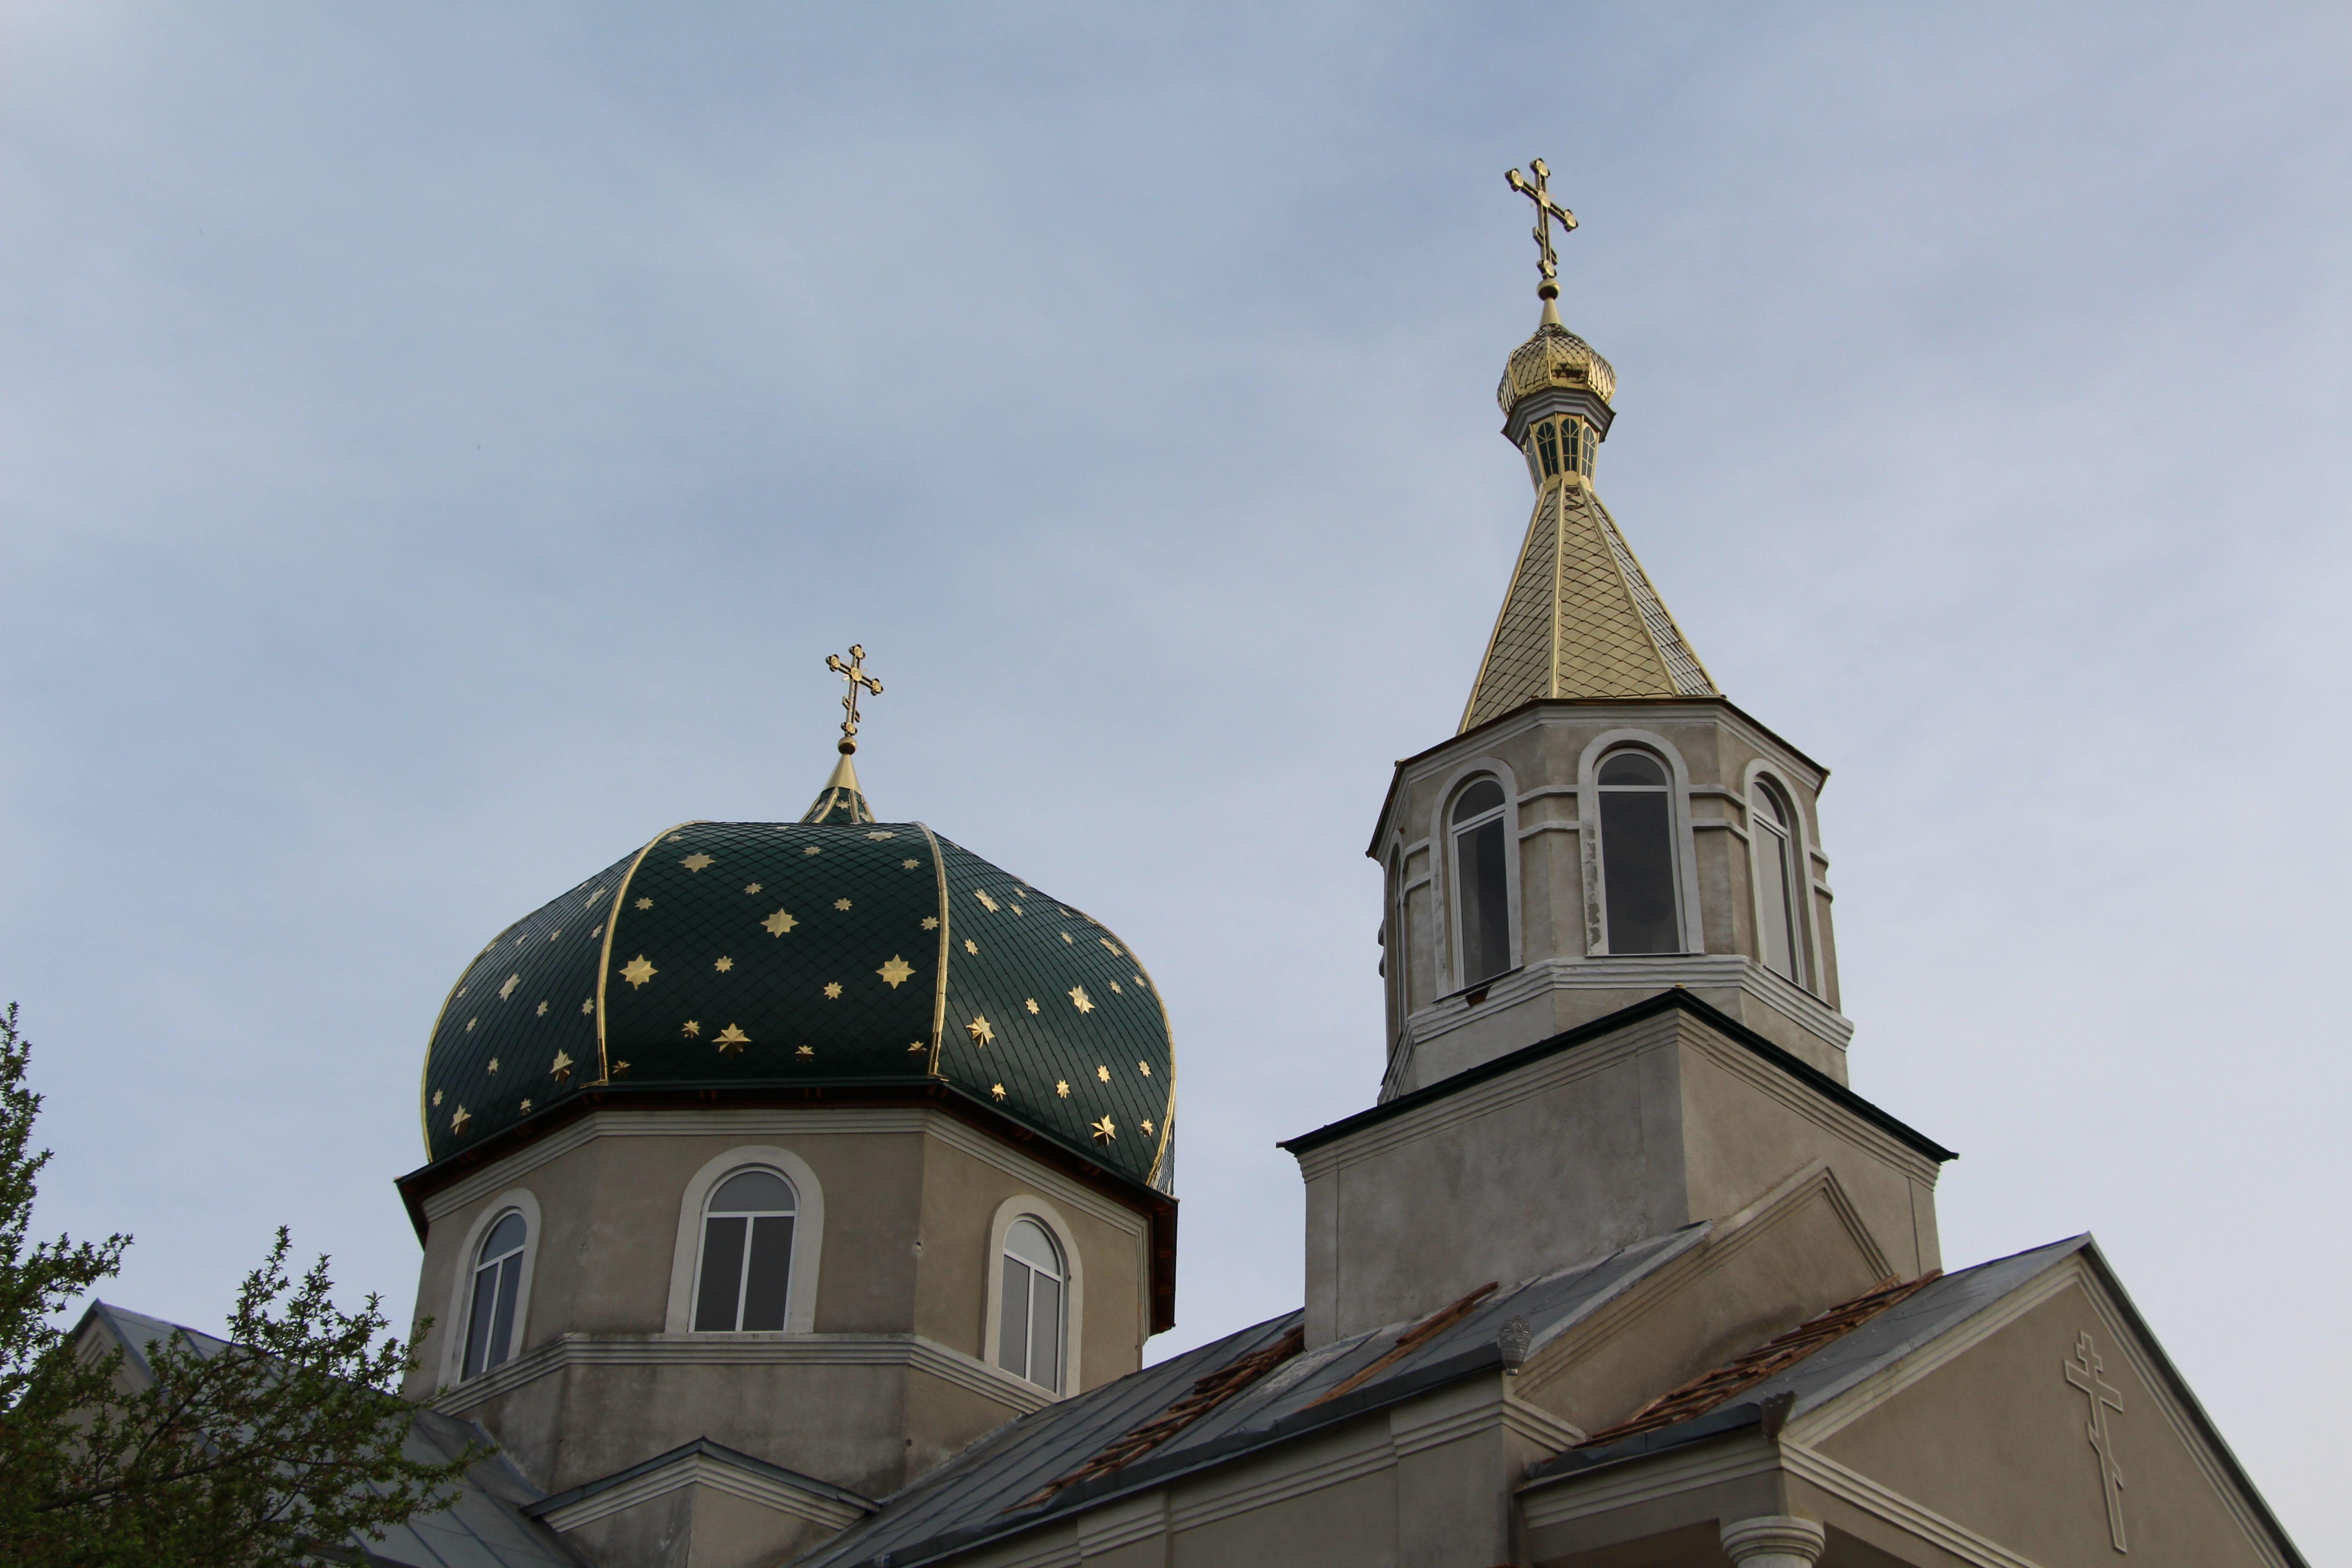 (ФОТО) В Етулии закончили сборку купола колокольни храма